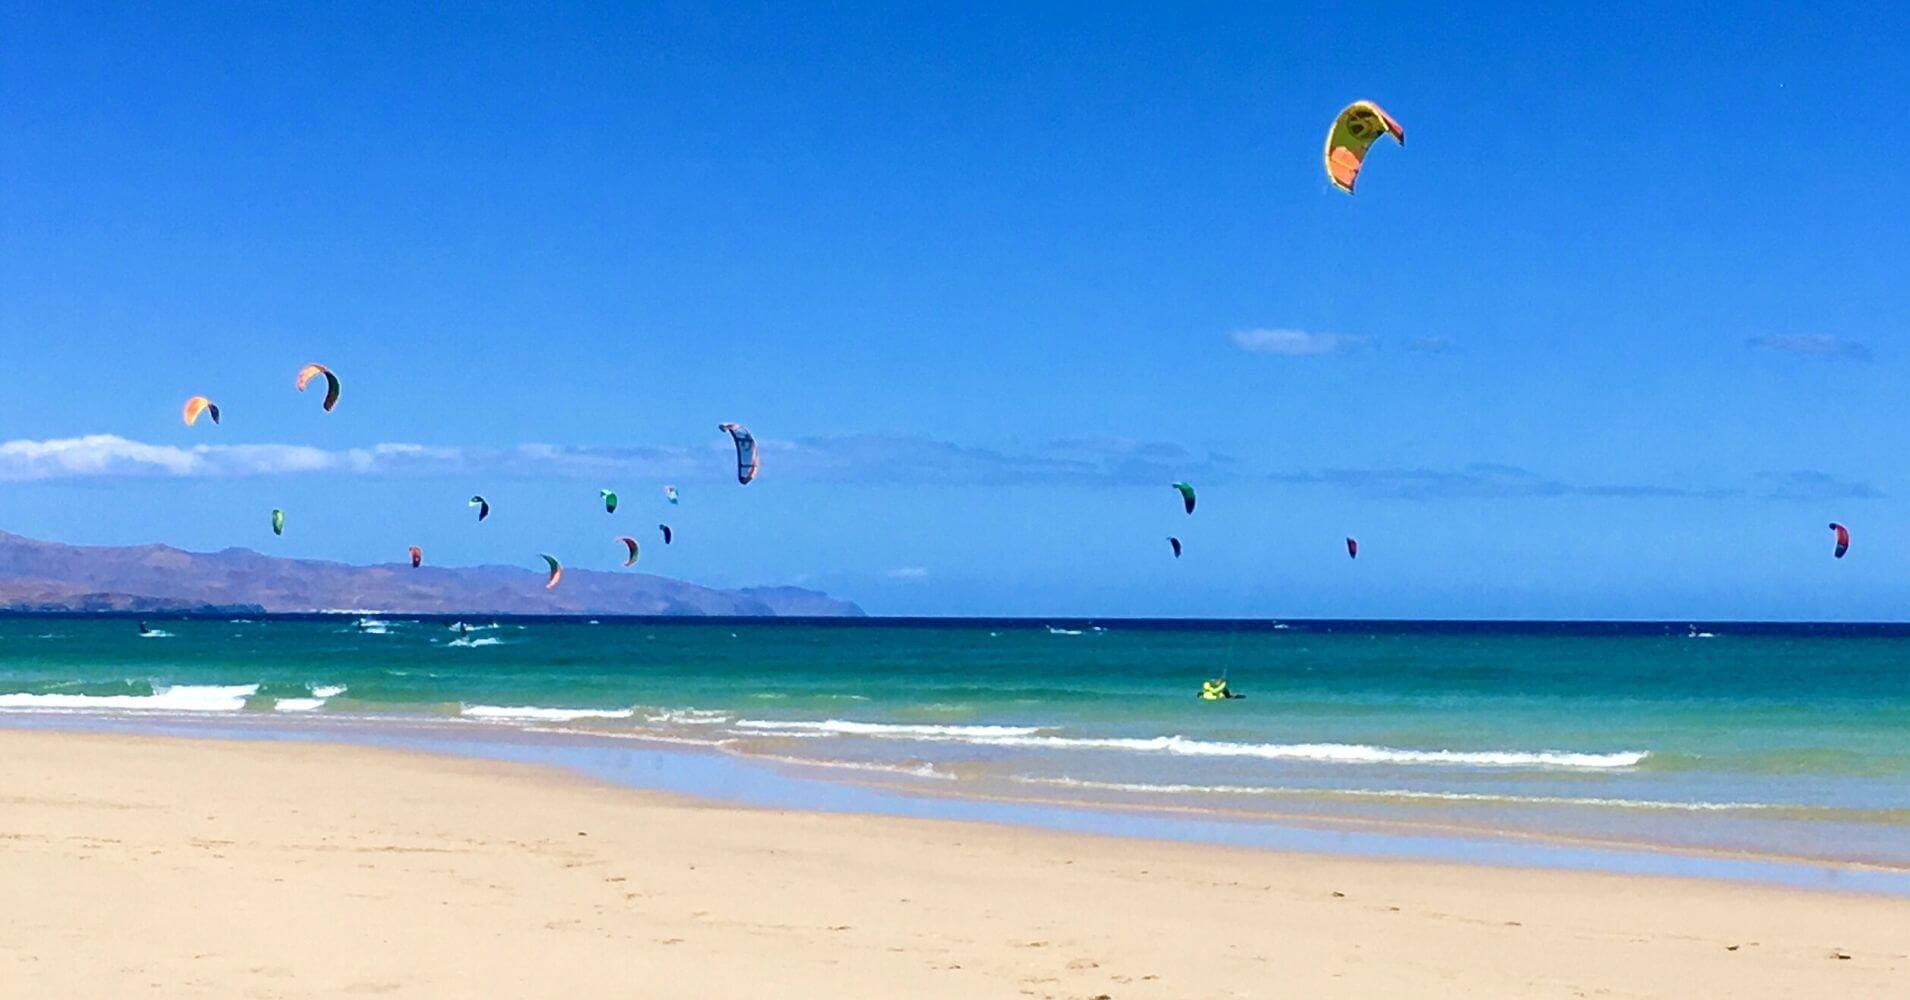 Playa de Jandía. Kitesurf. Canarias.